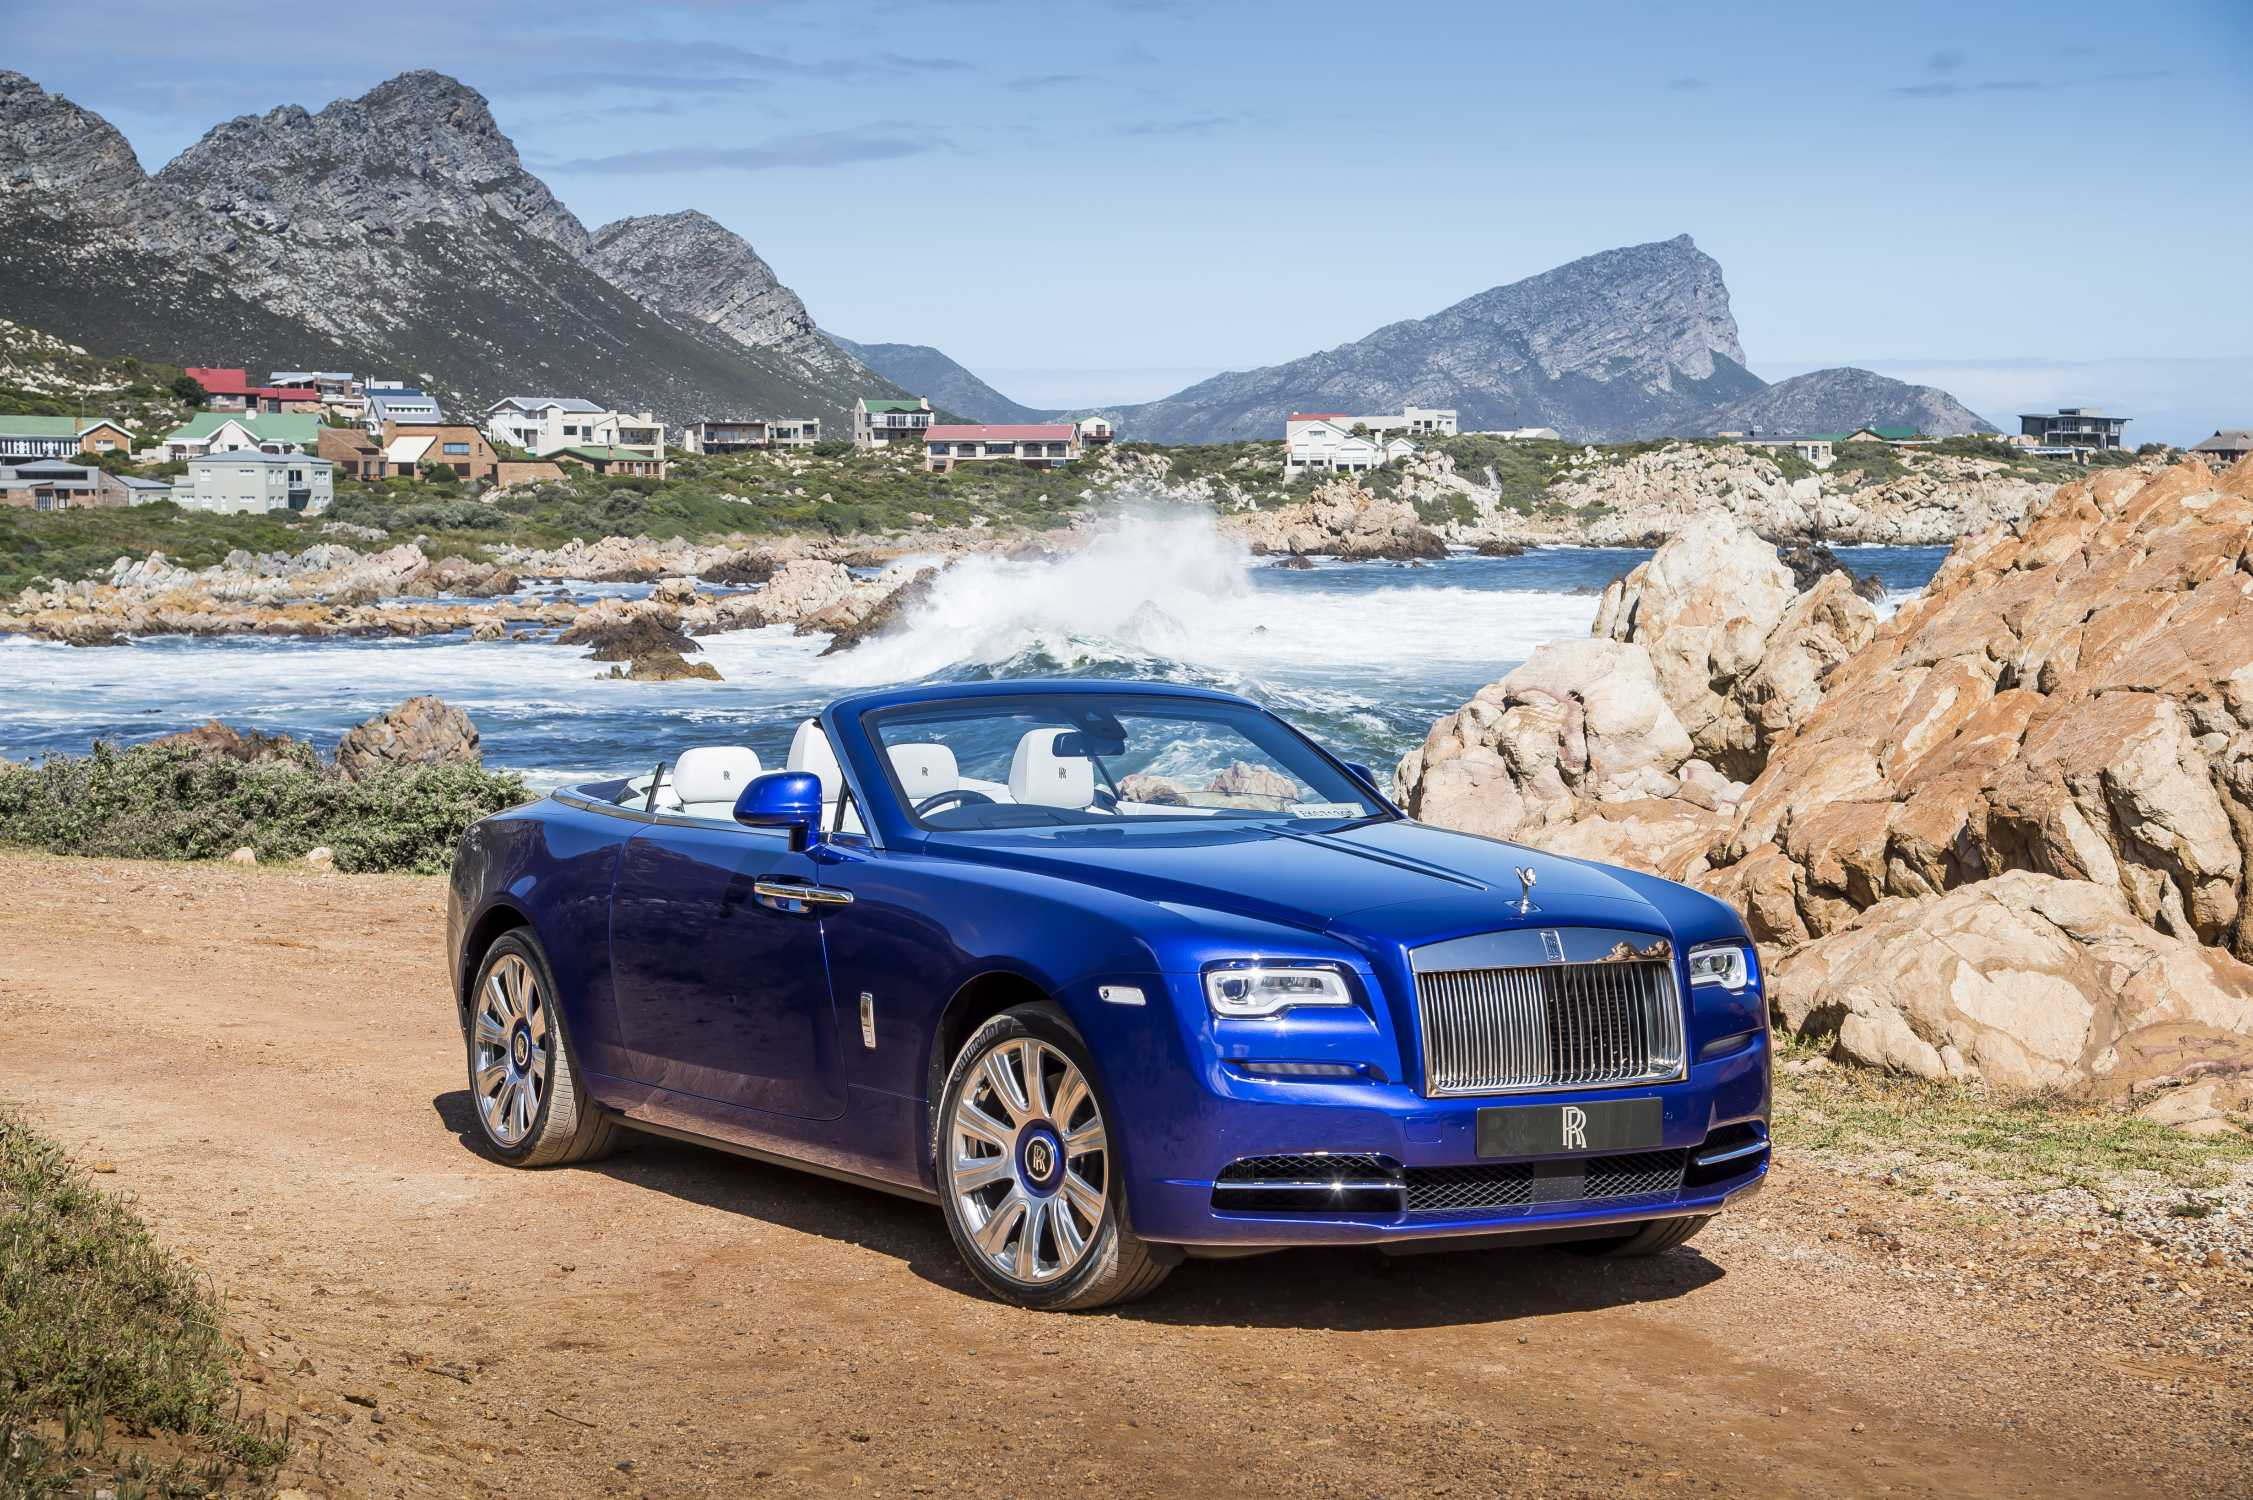 Best Luxury Cars - Rolls-Royce Dawn